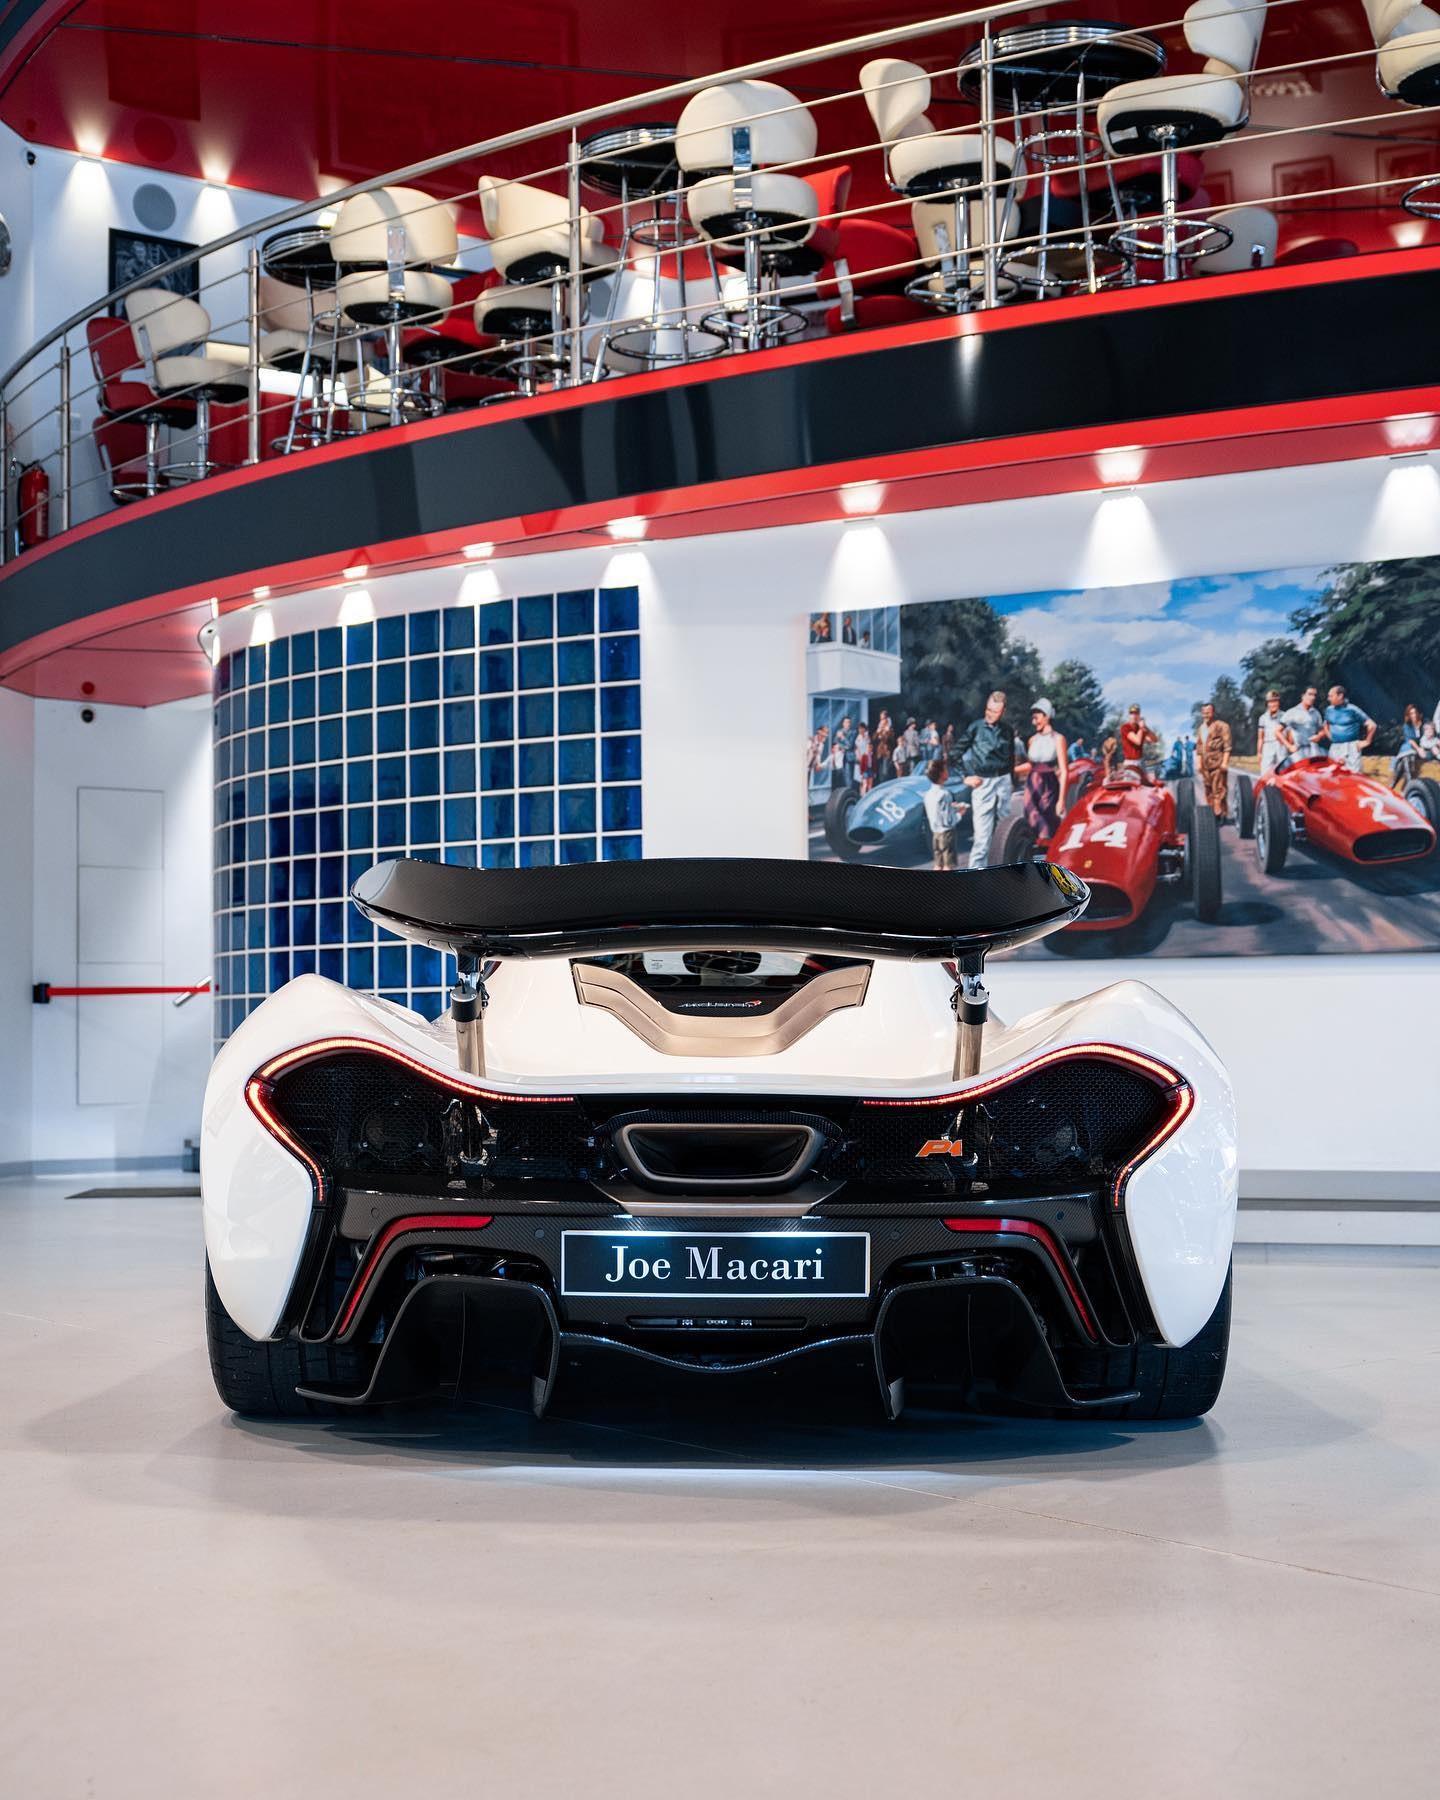 2013_McLaren_P1_sale-0002